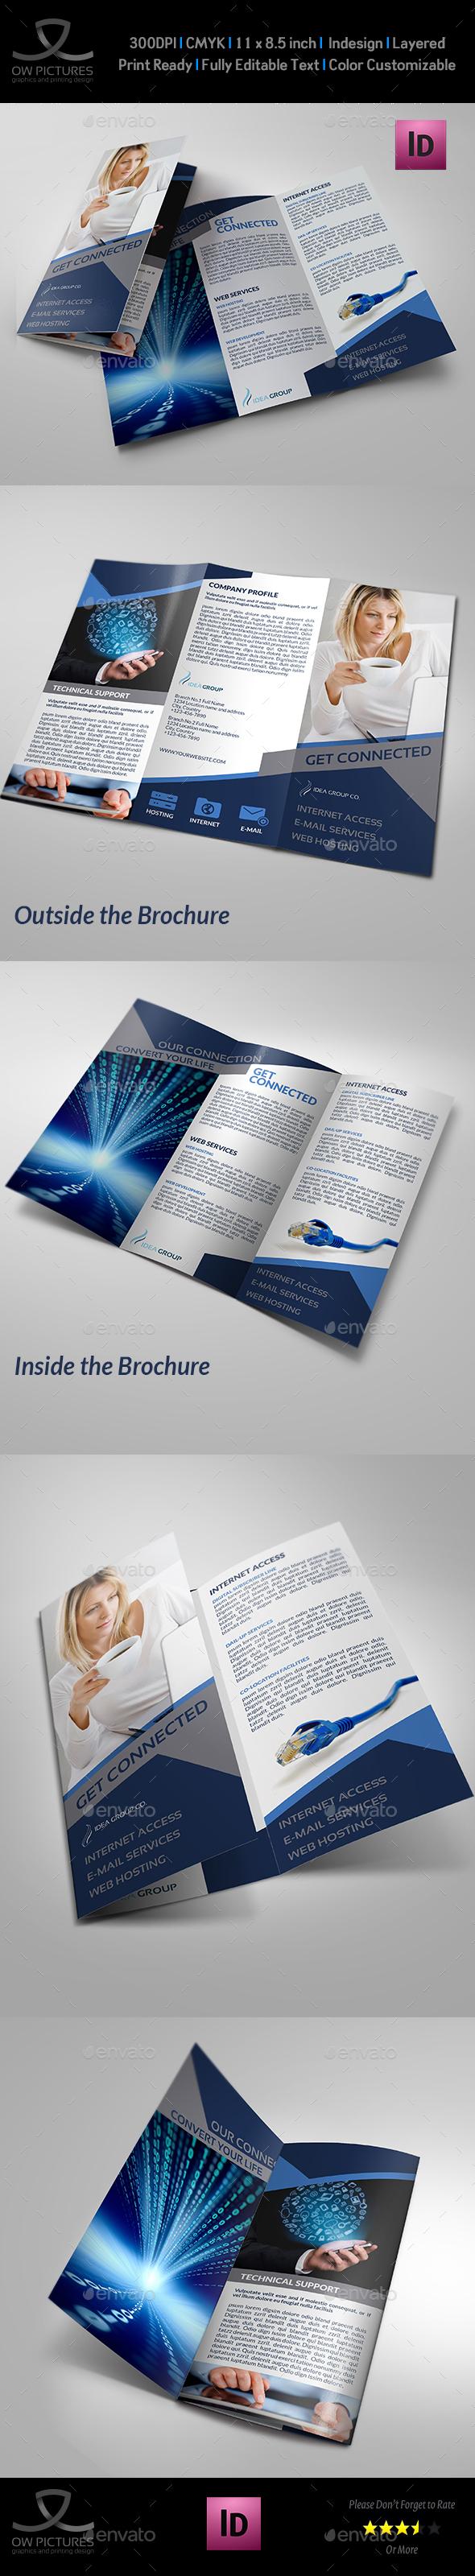 Internet Provider Services Tri-Fold Brochure - Brochures Print Templates